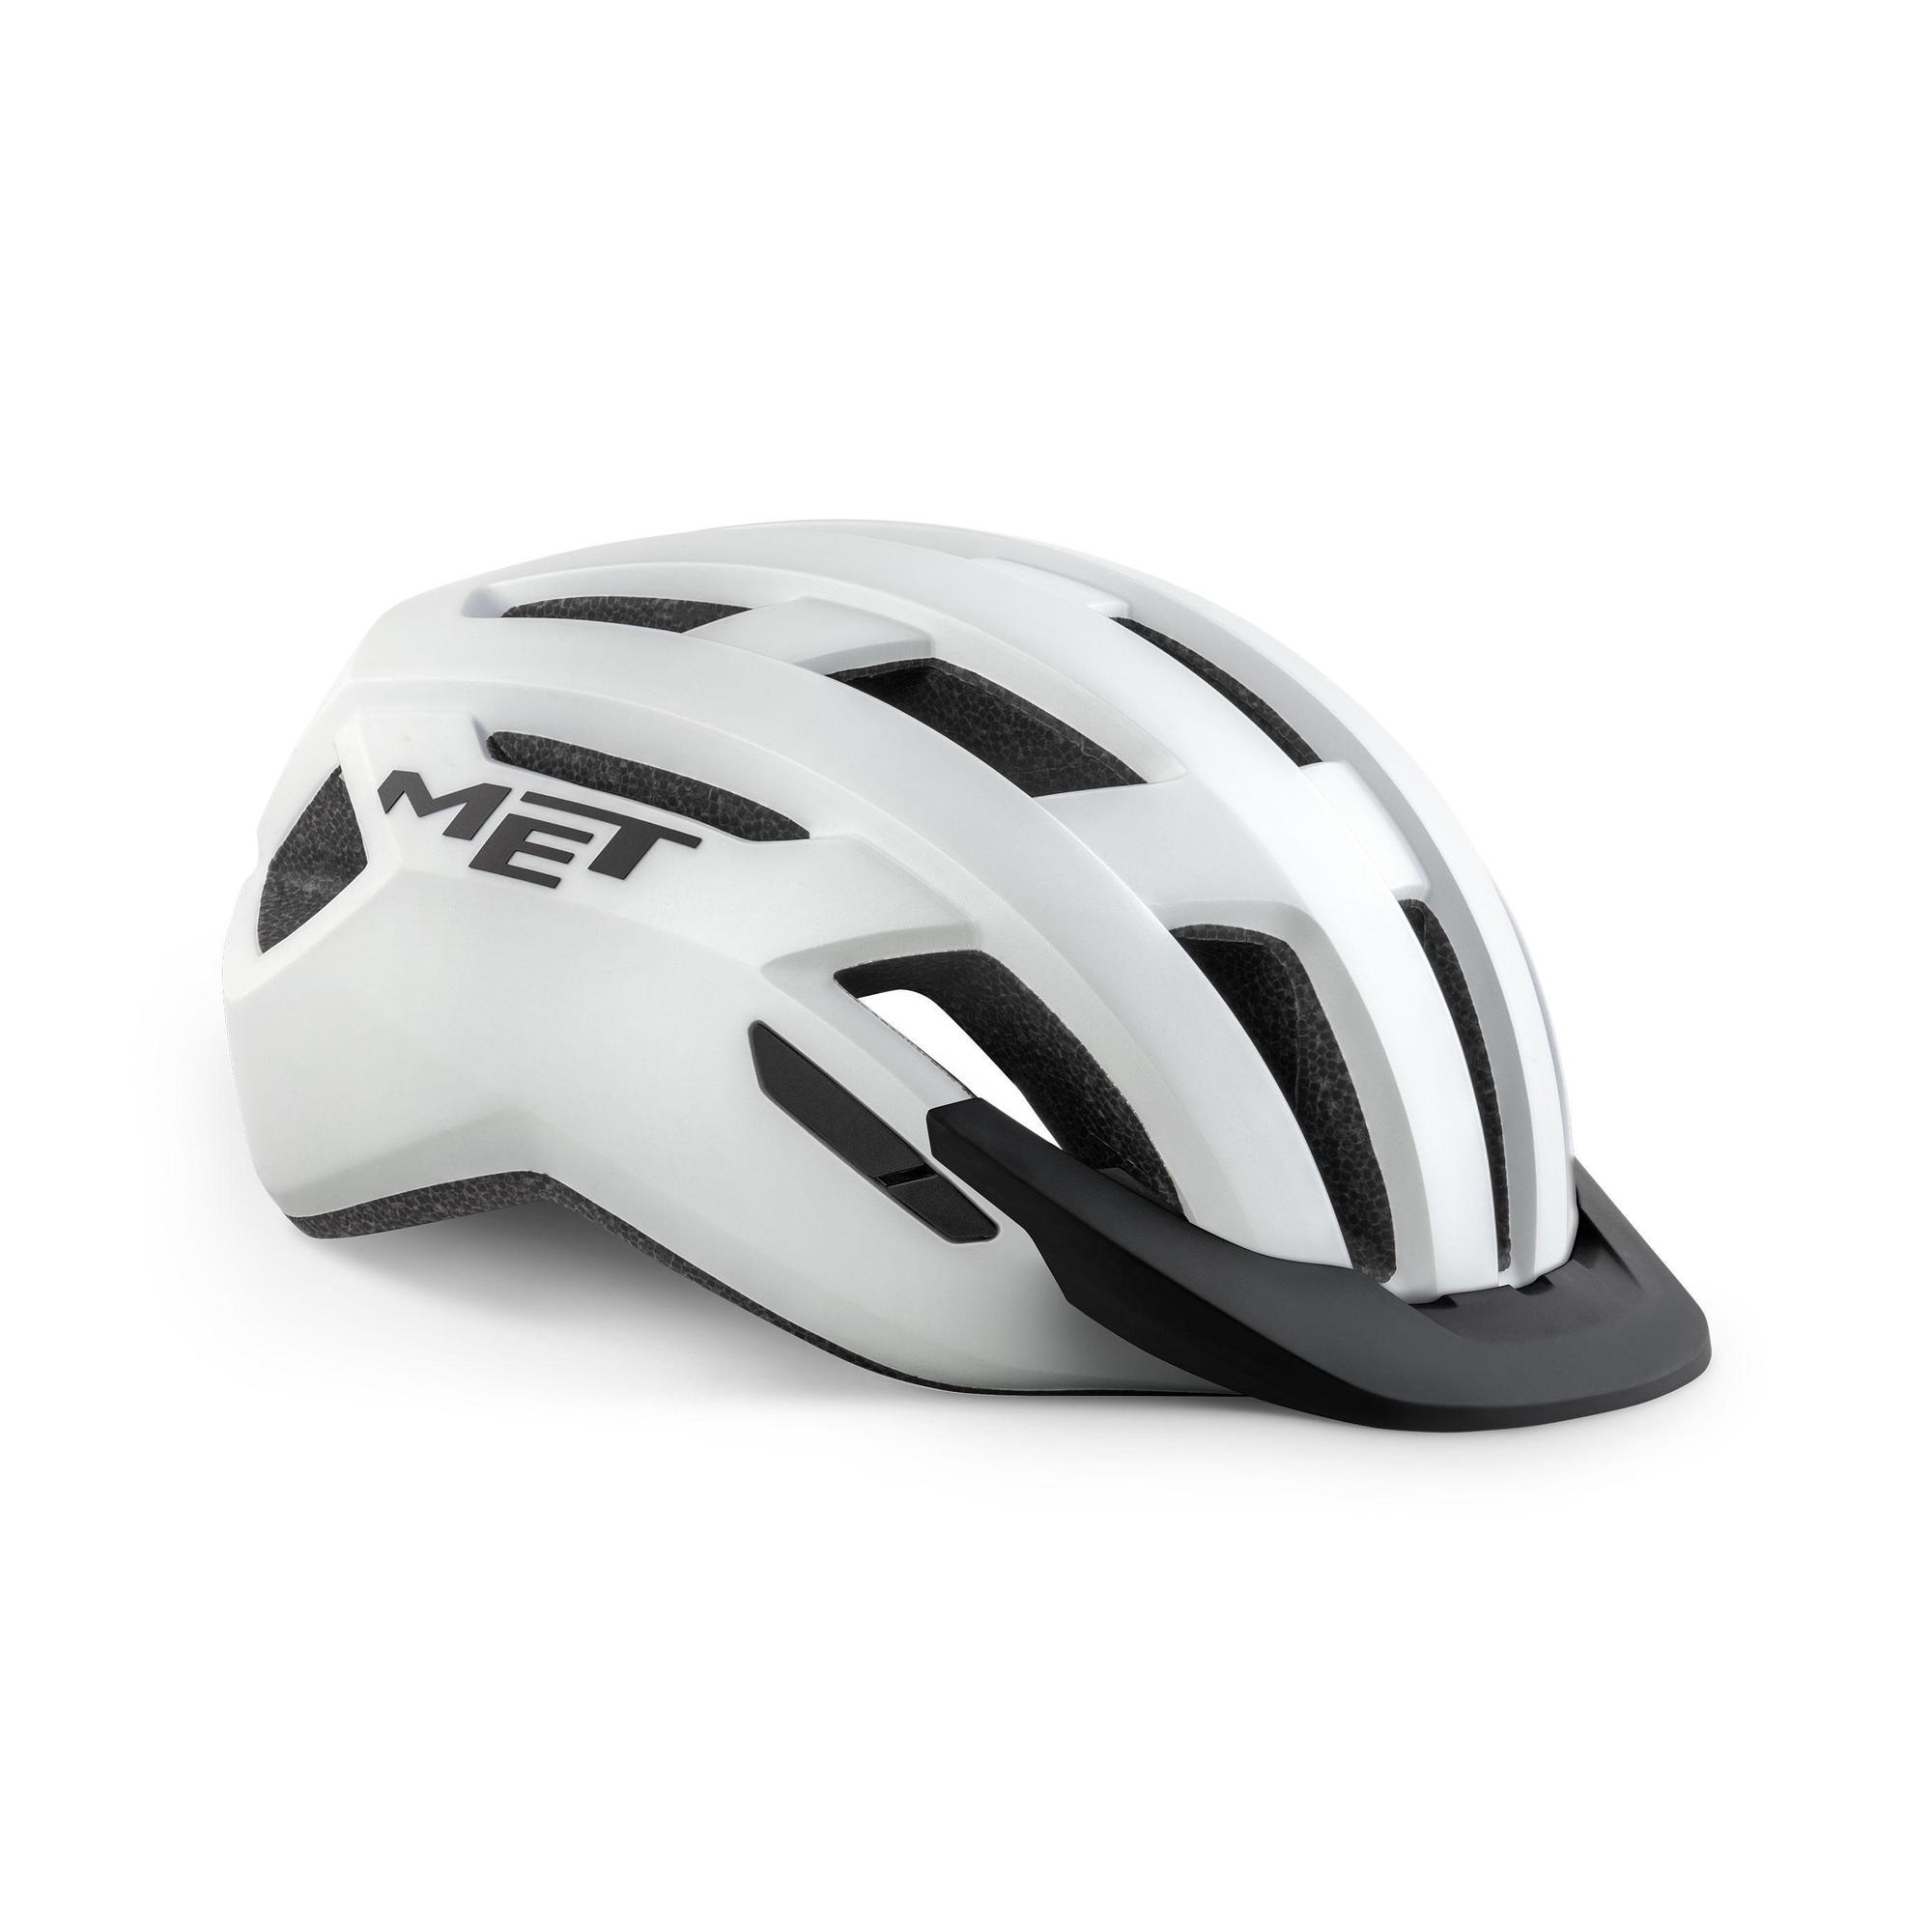 MET Allroad Helm